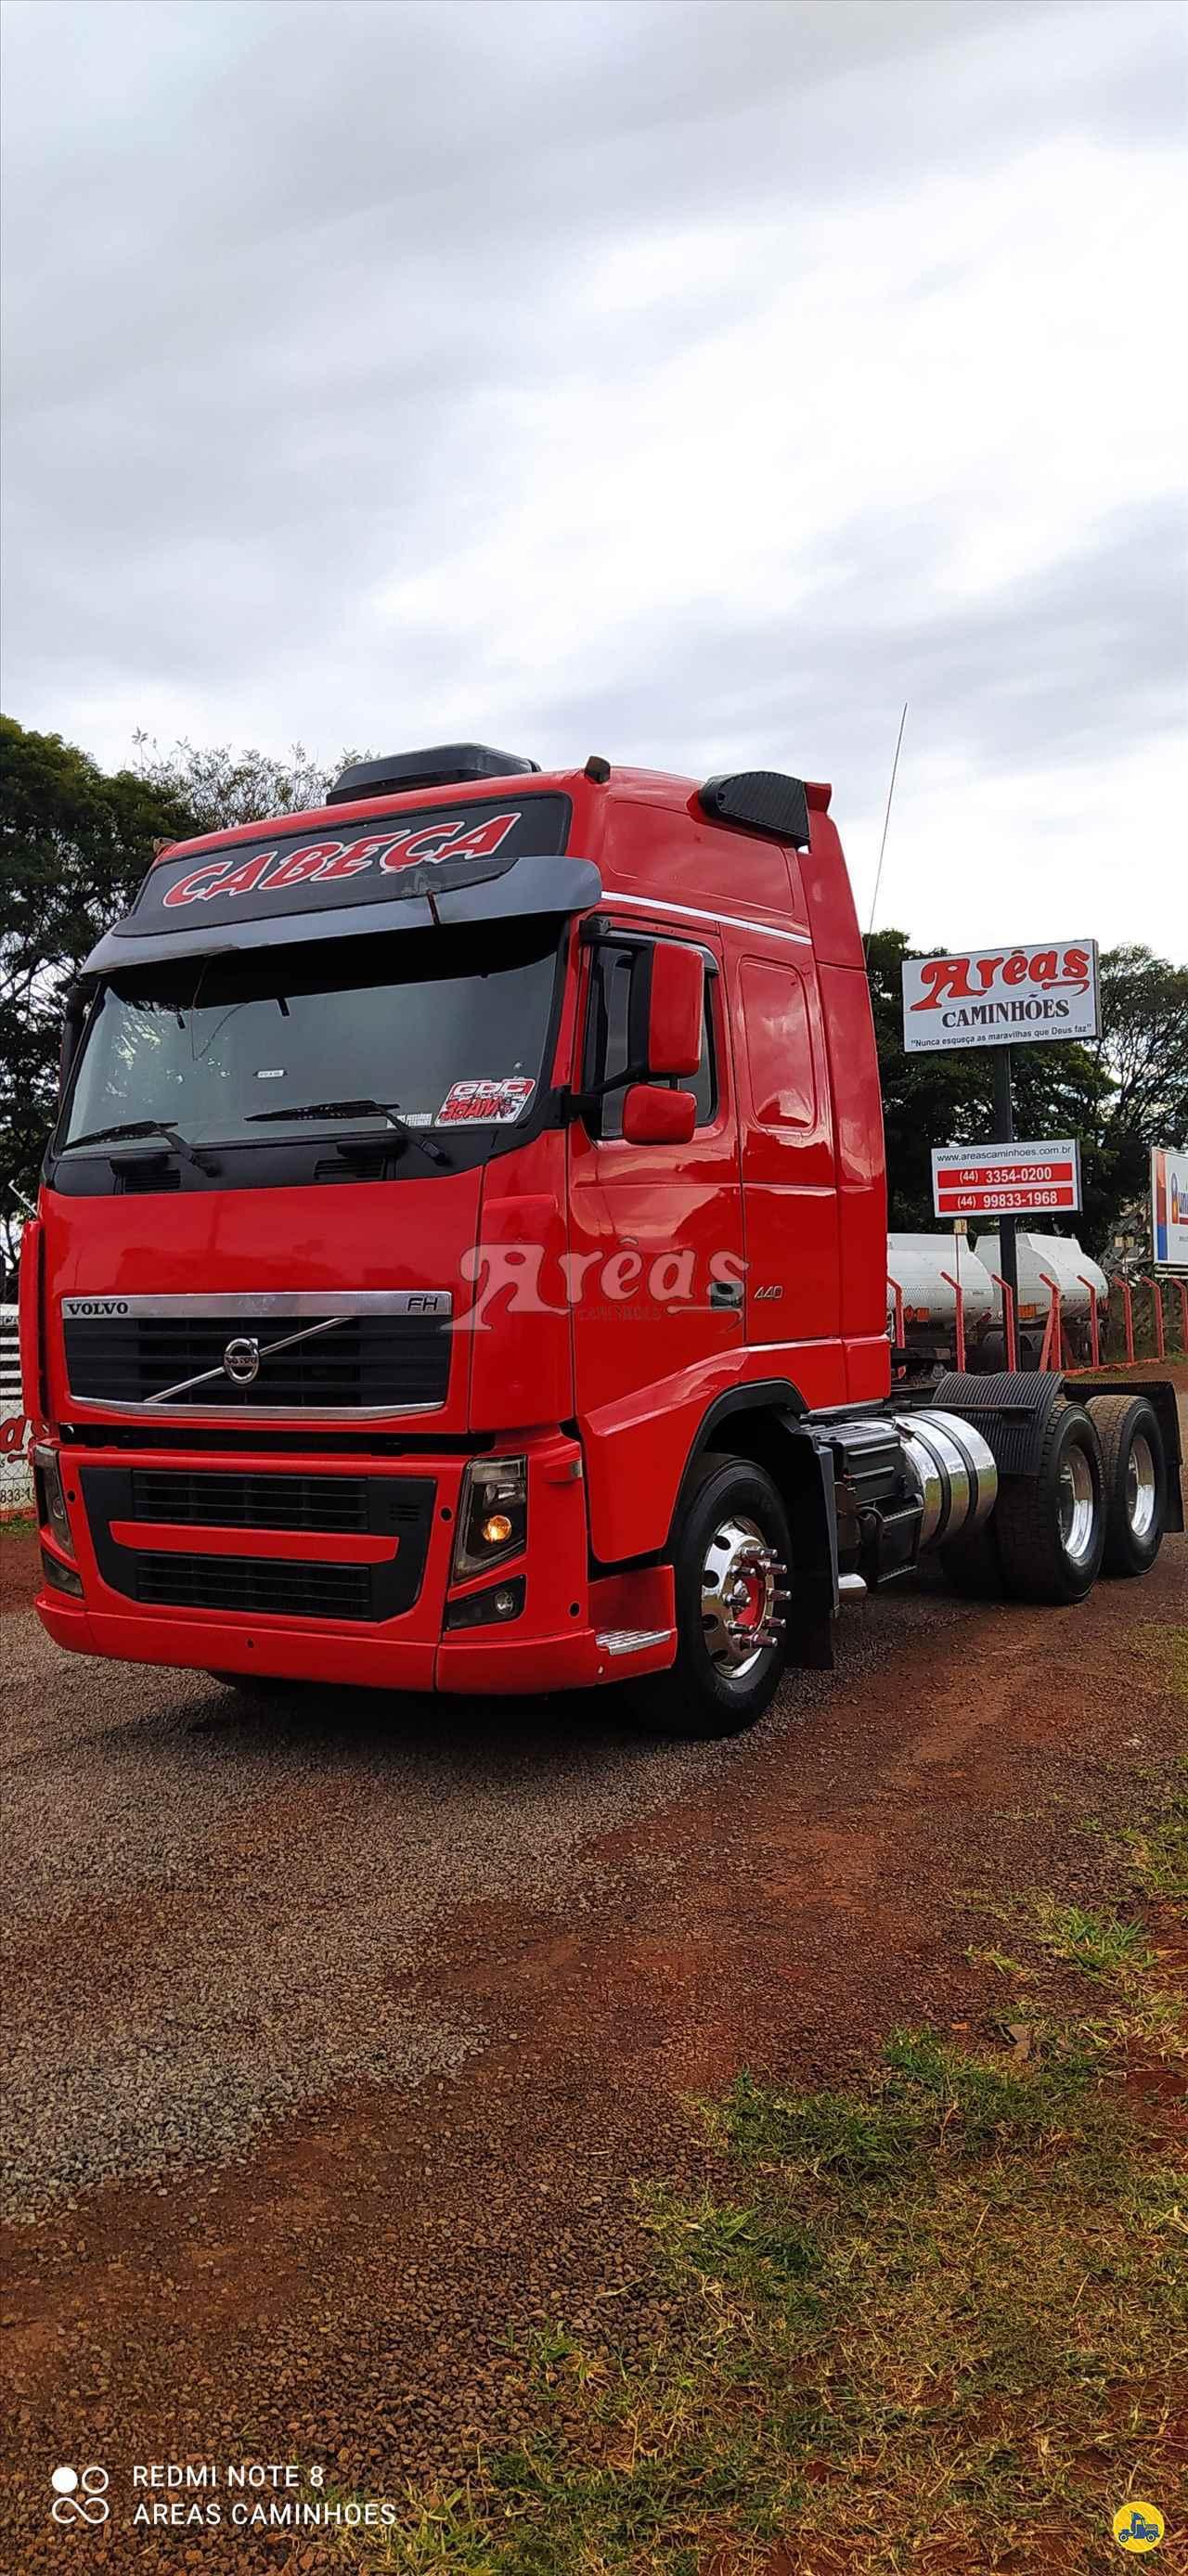 CAMINHAO VOLVO VOLVO FH 440 Cavalo Mecânico Truck 6x2 Arêas Caminhões MARINGA PARANÁ PR